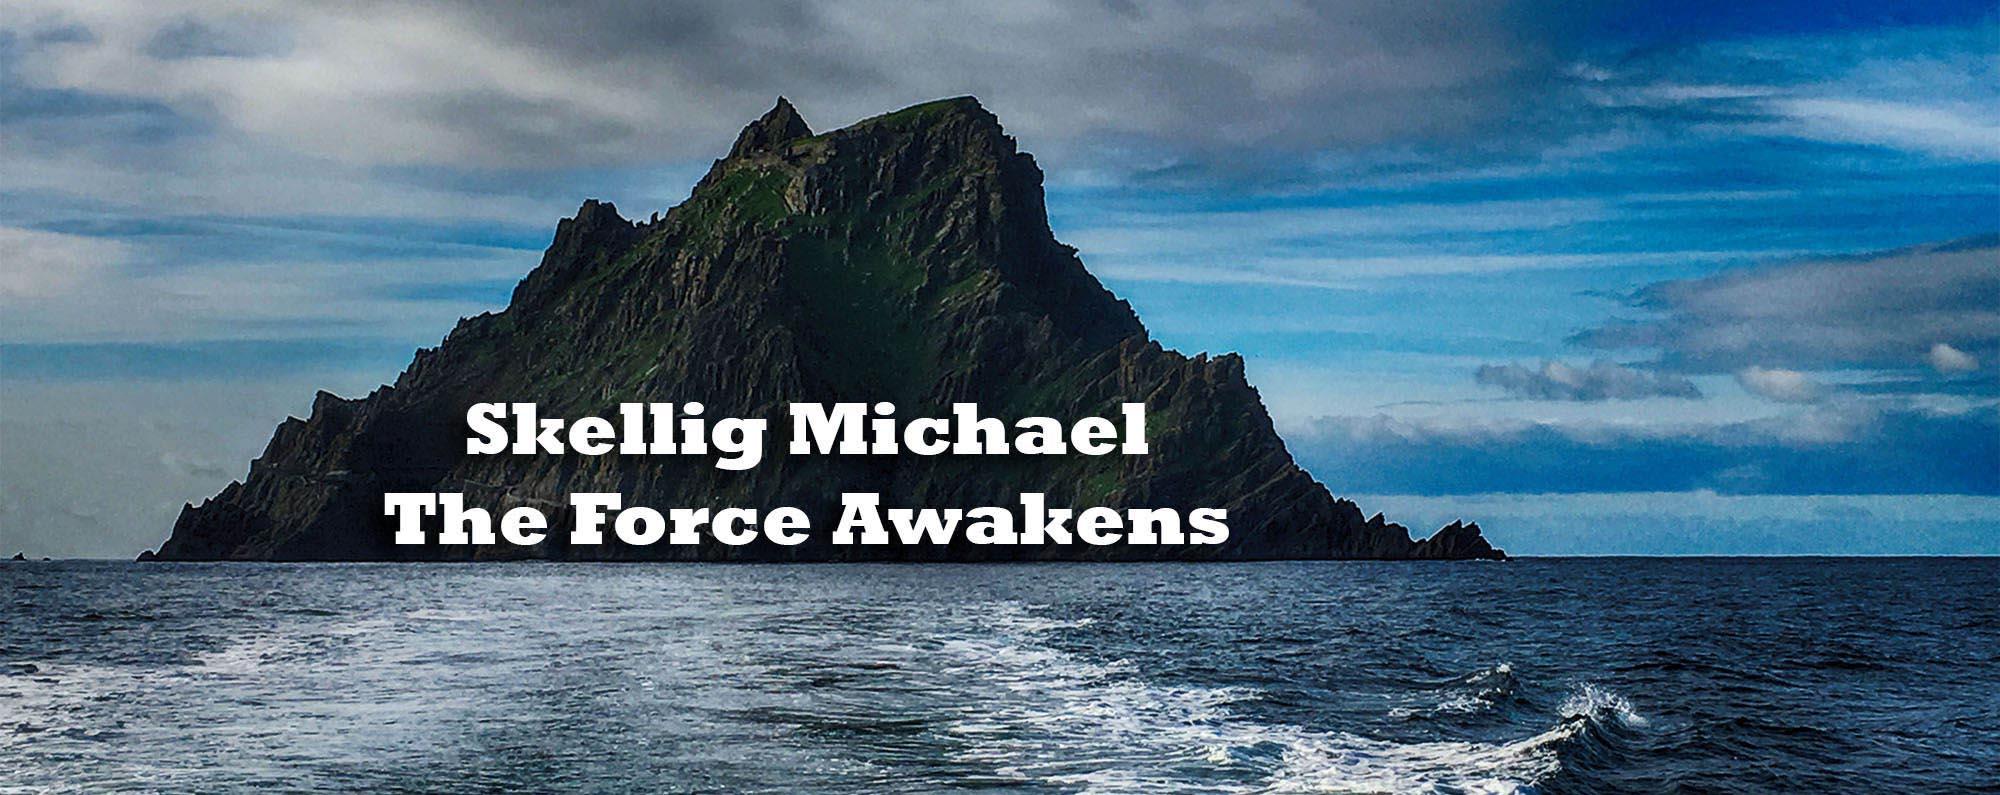 skellig michael force awakens